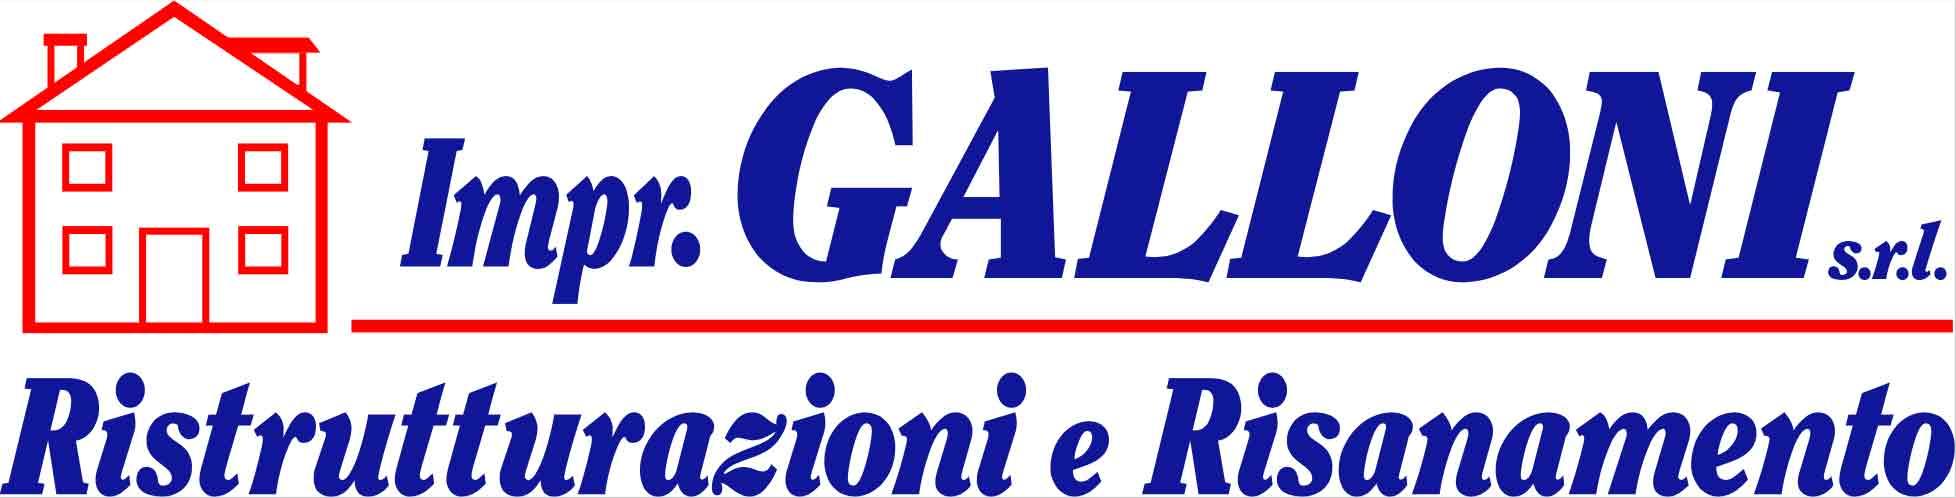 Impresa Galloni